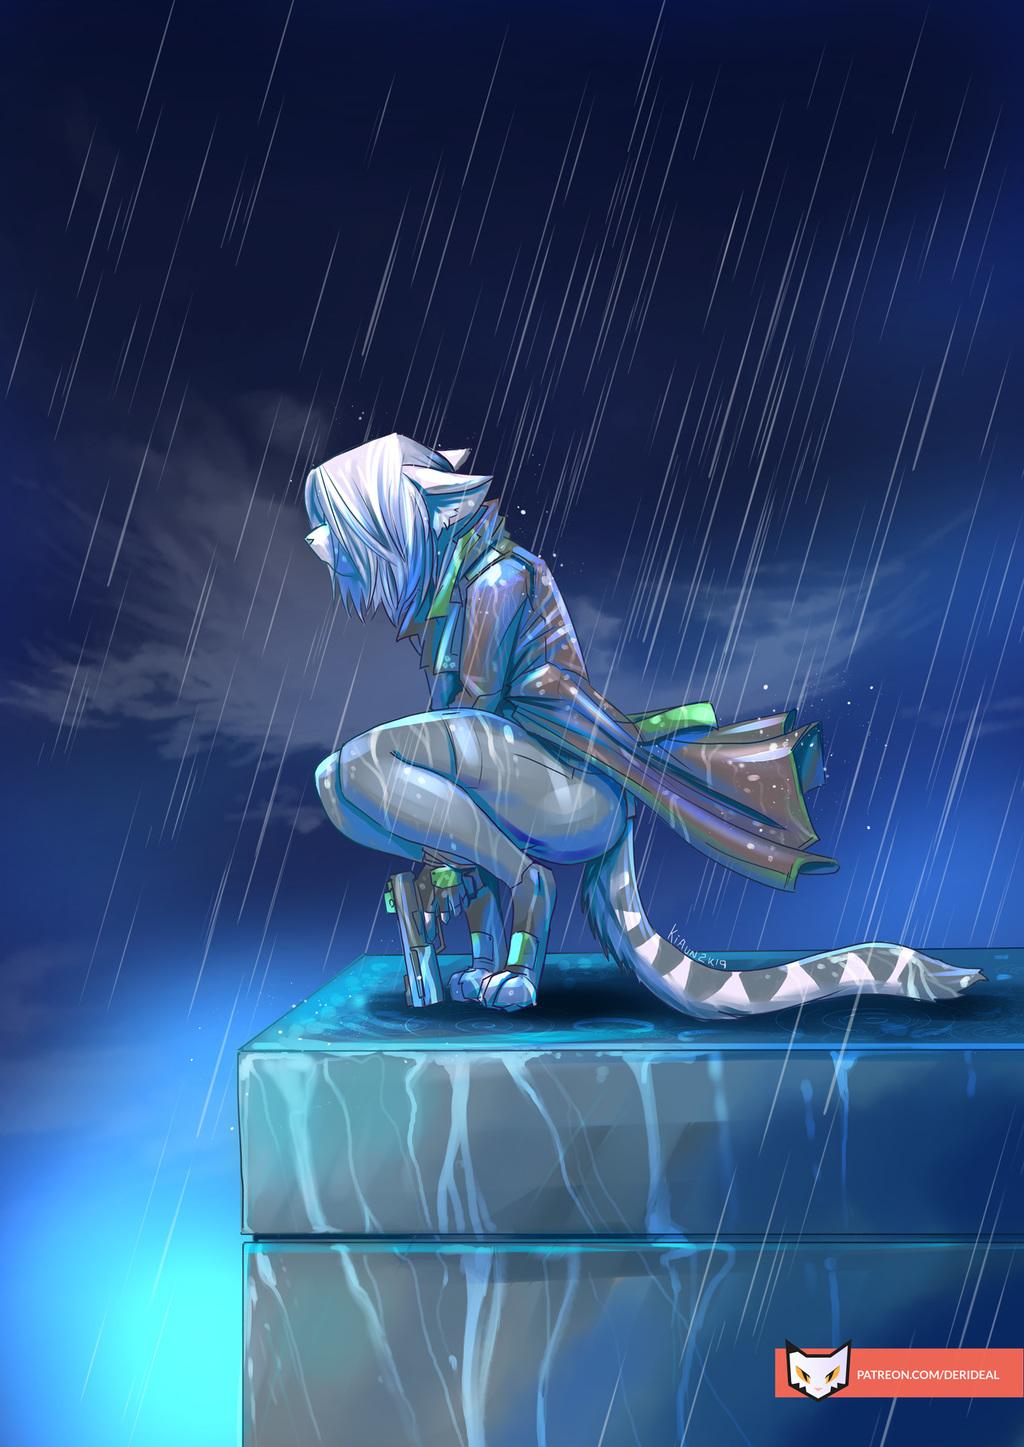 Ivory under the rain